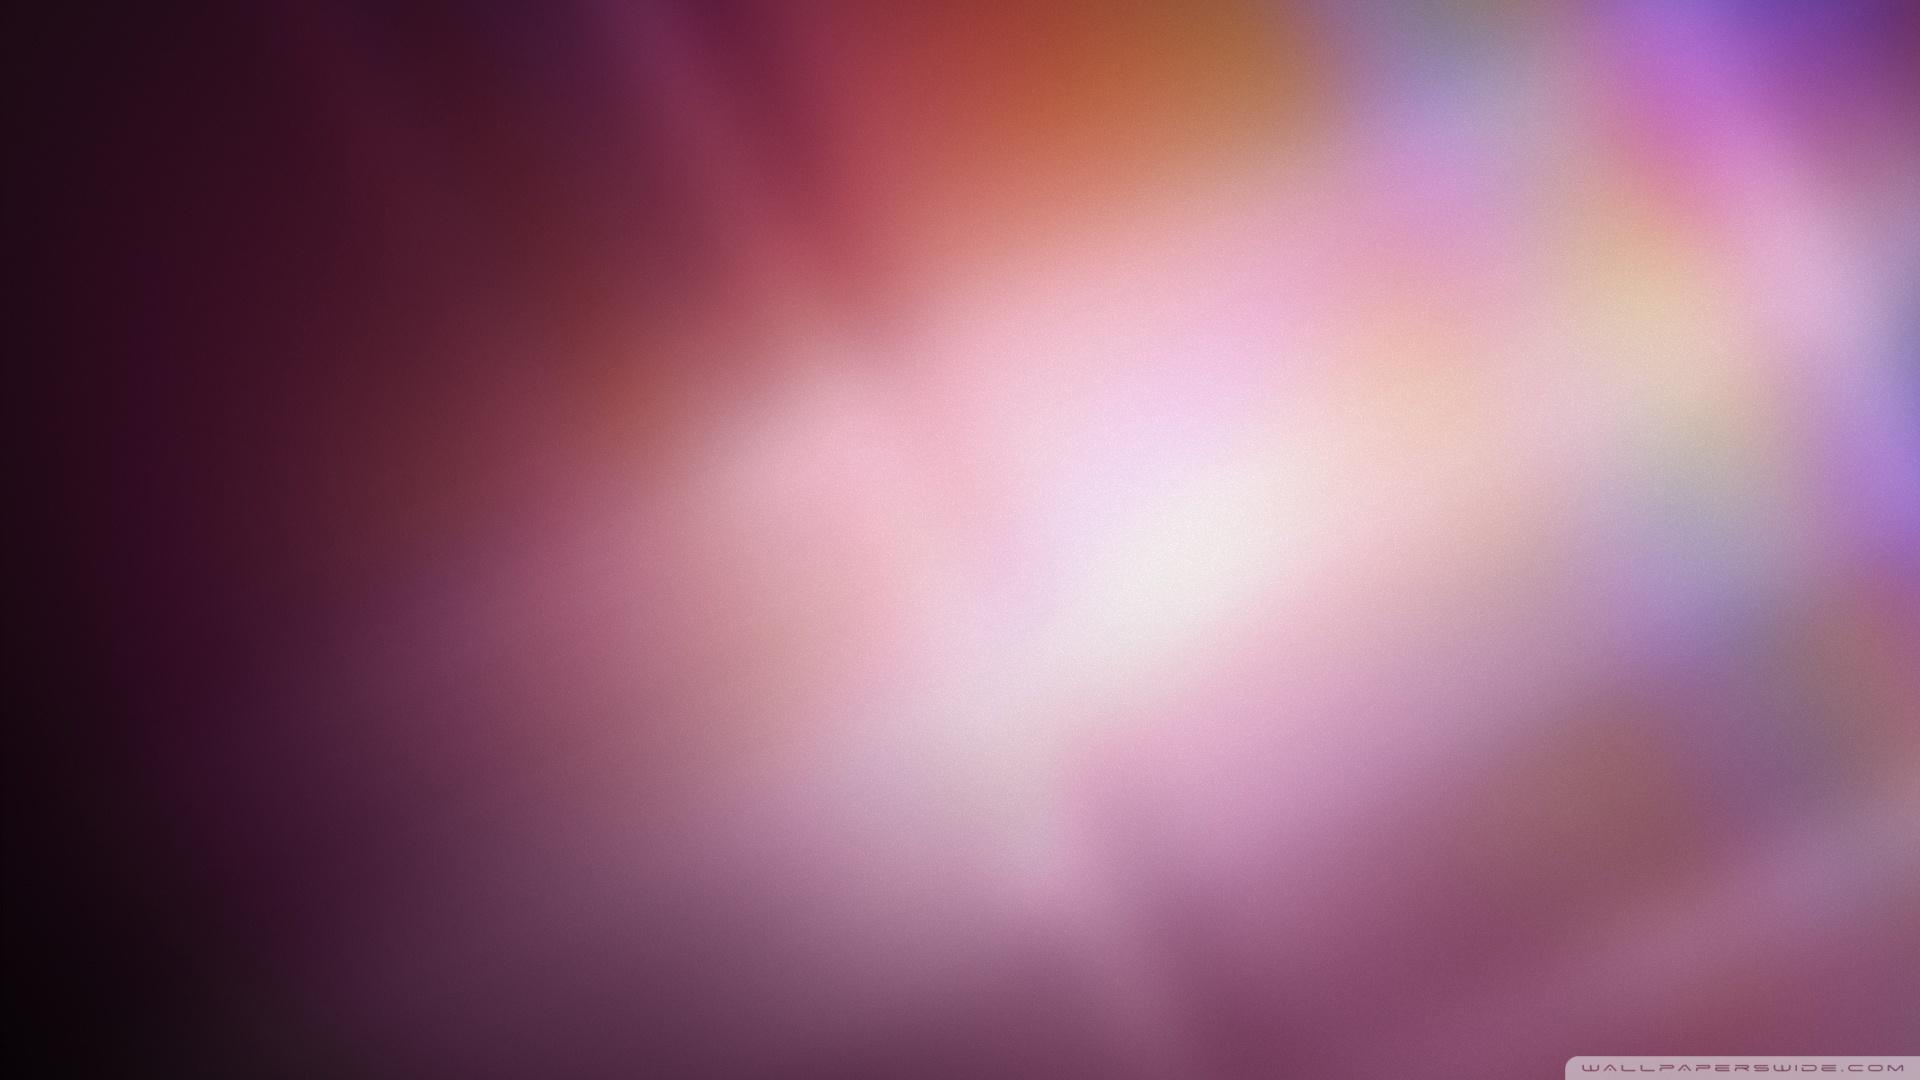 Ubuntu 10 10 Wallpaper 1920x1080 Ubuntu 10 10 1920x1080